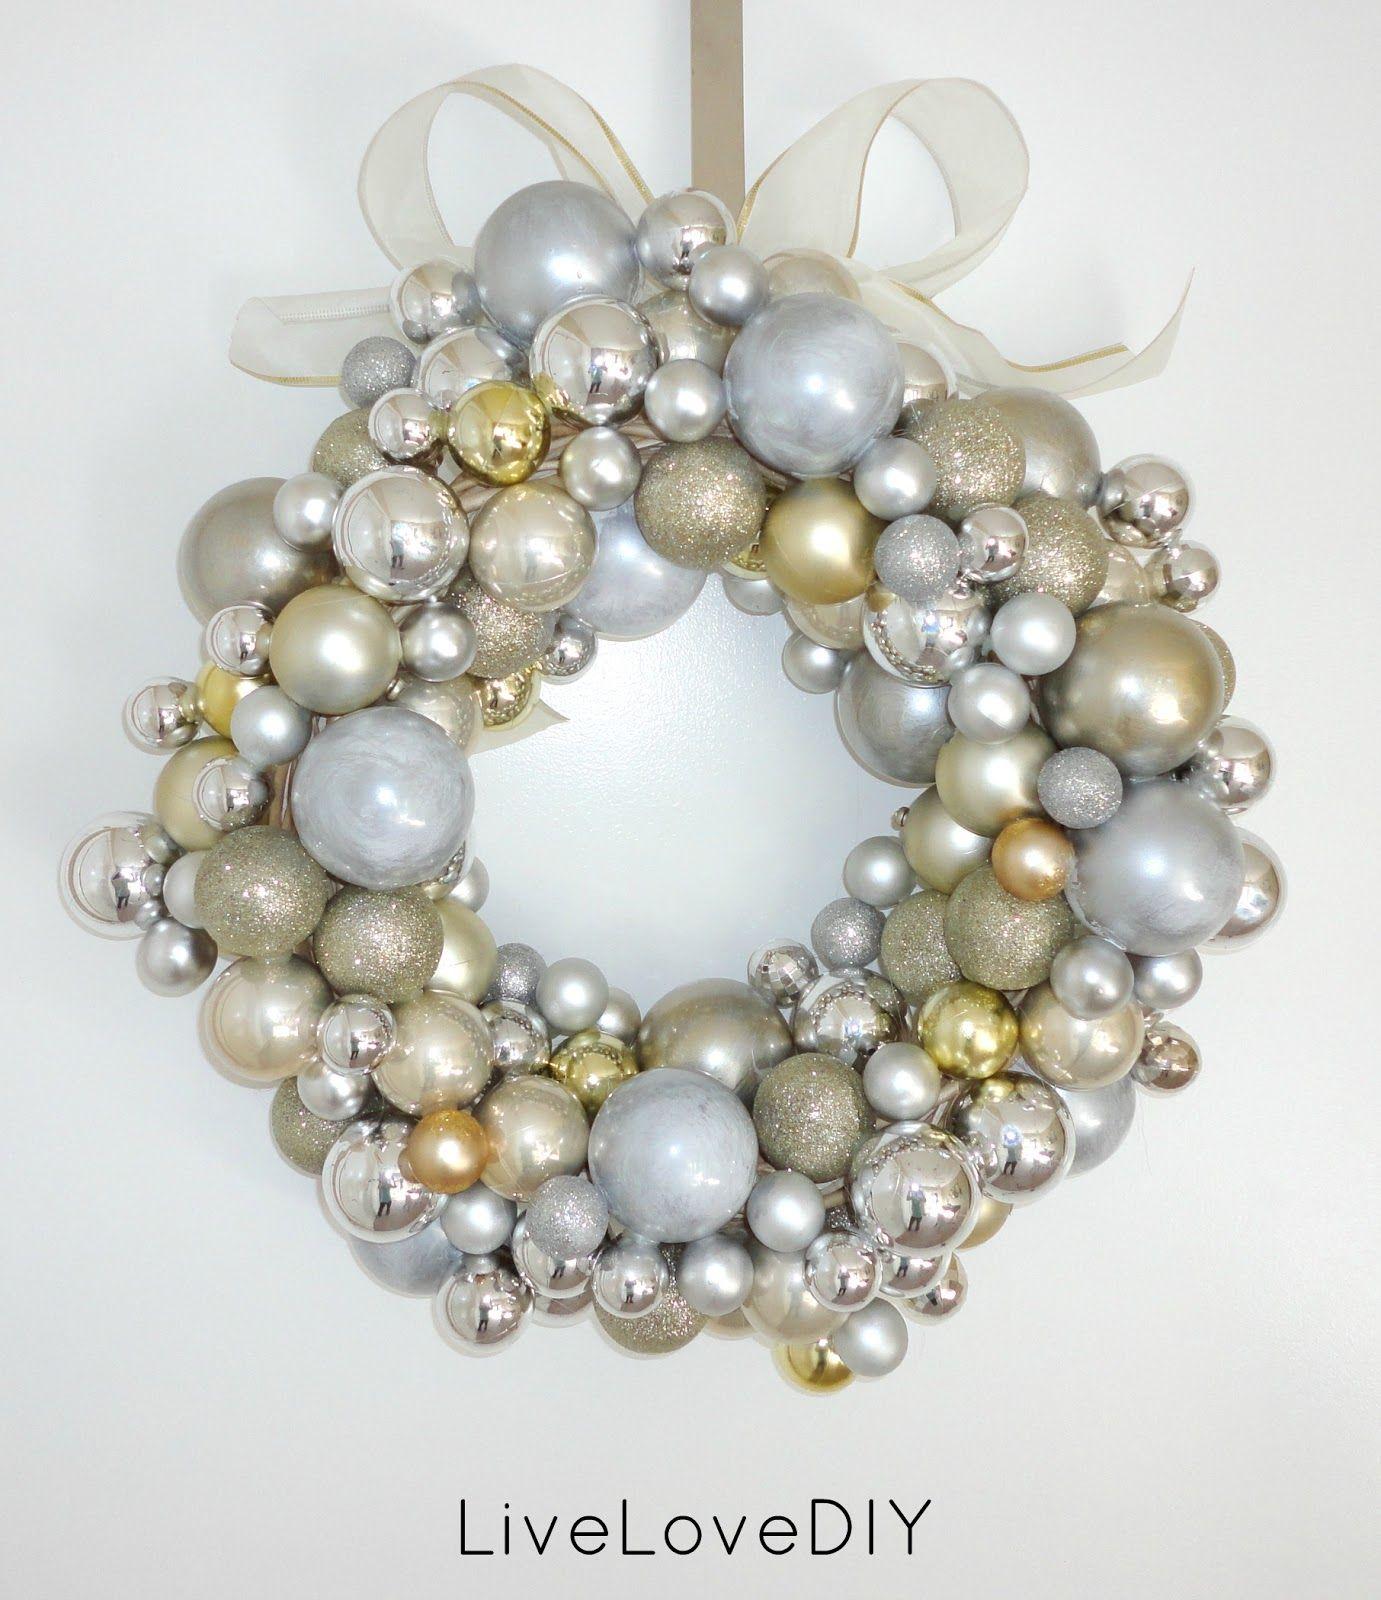 Decorating Ornament Balls Diy Inspiration Christmas Ornament Balls  Capitol Romance